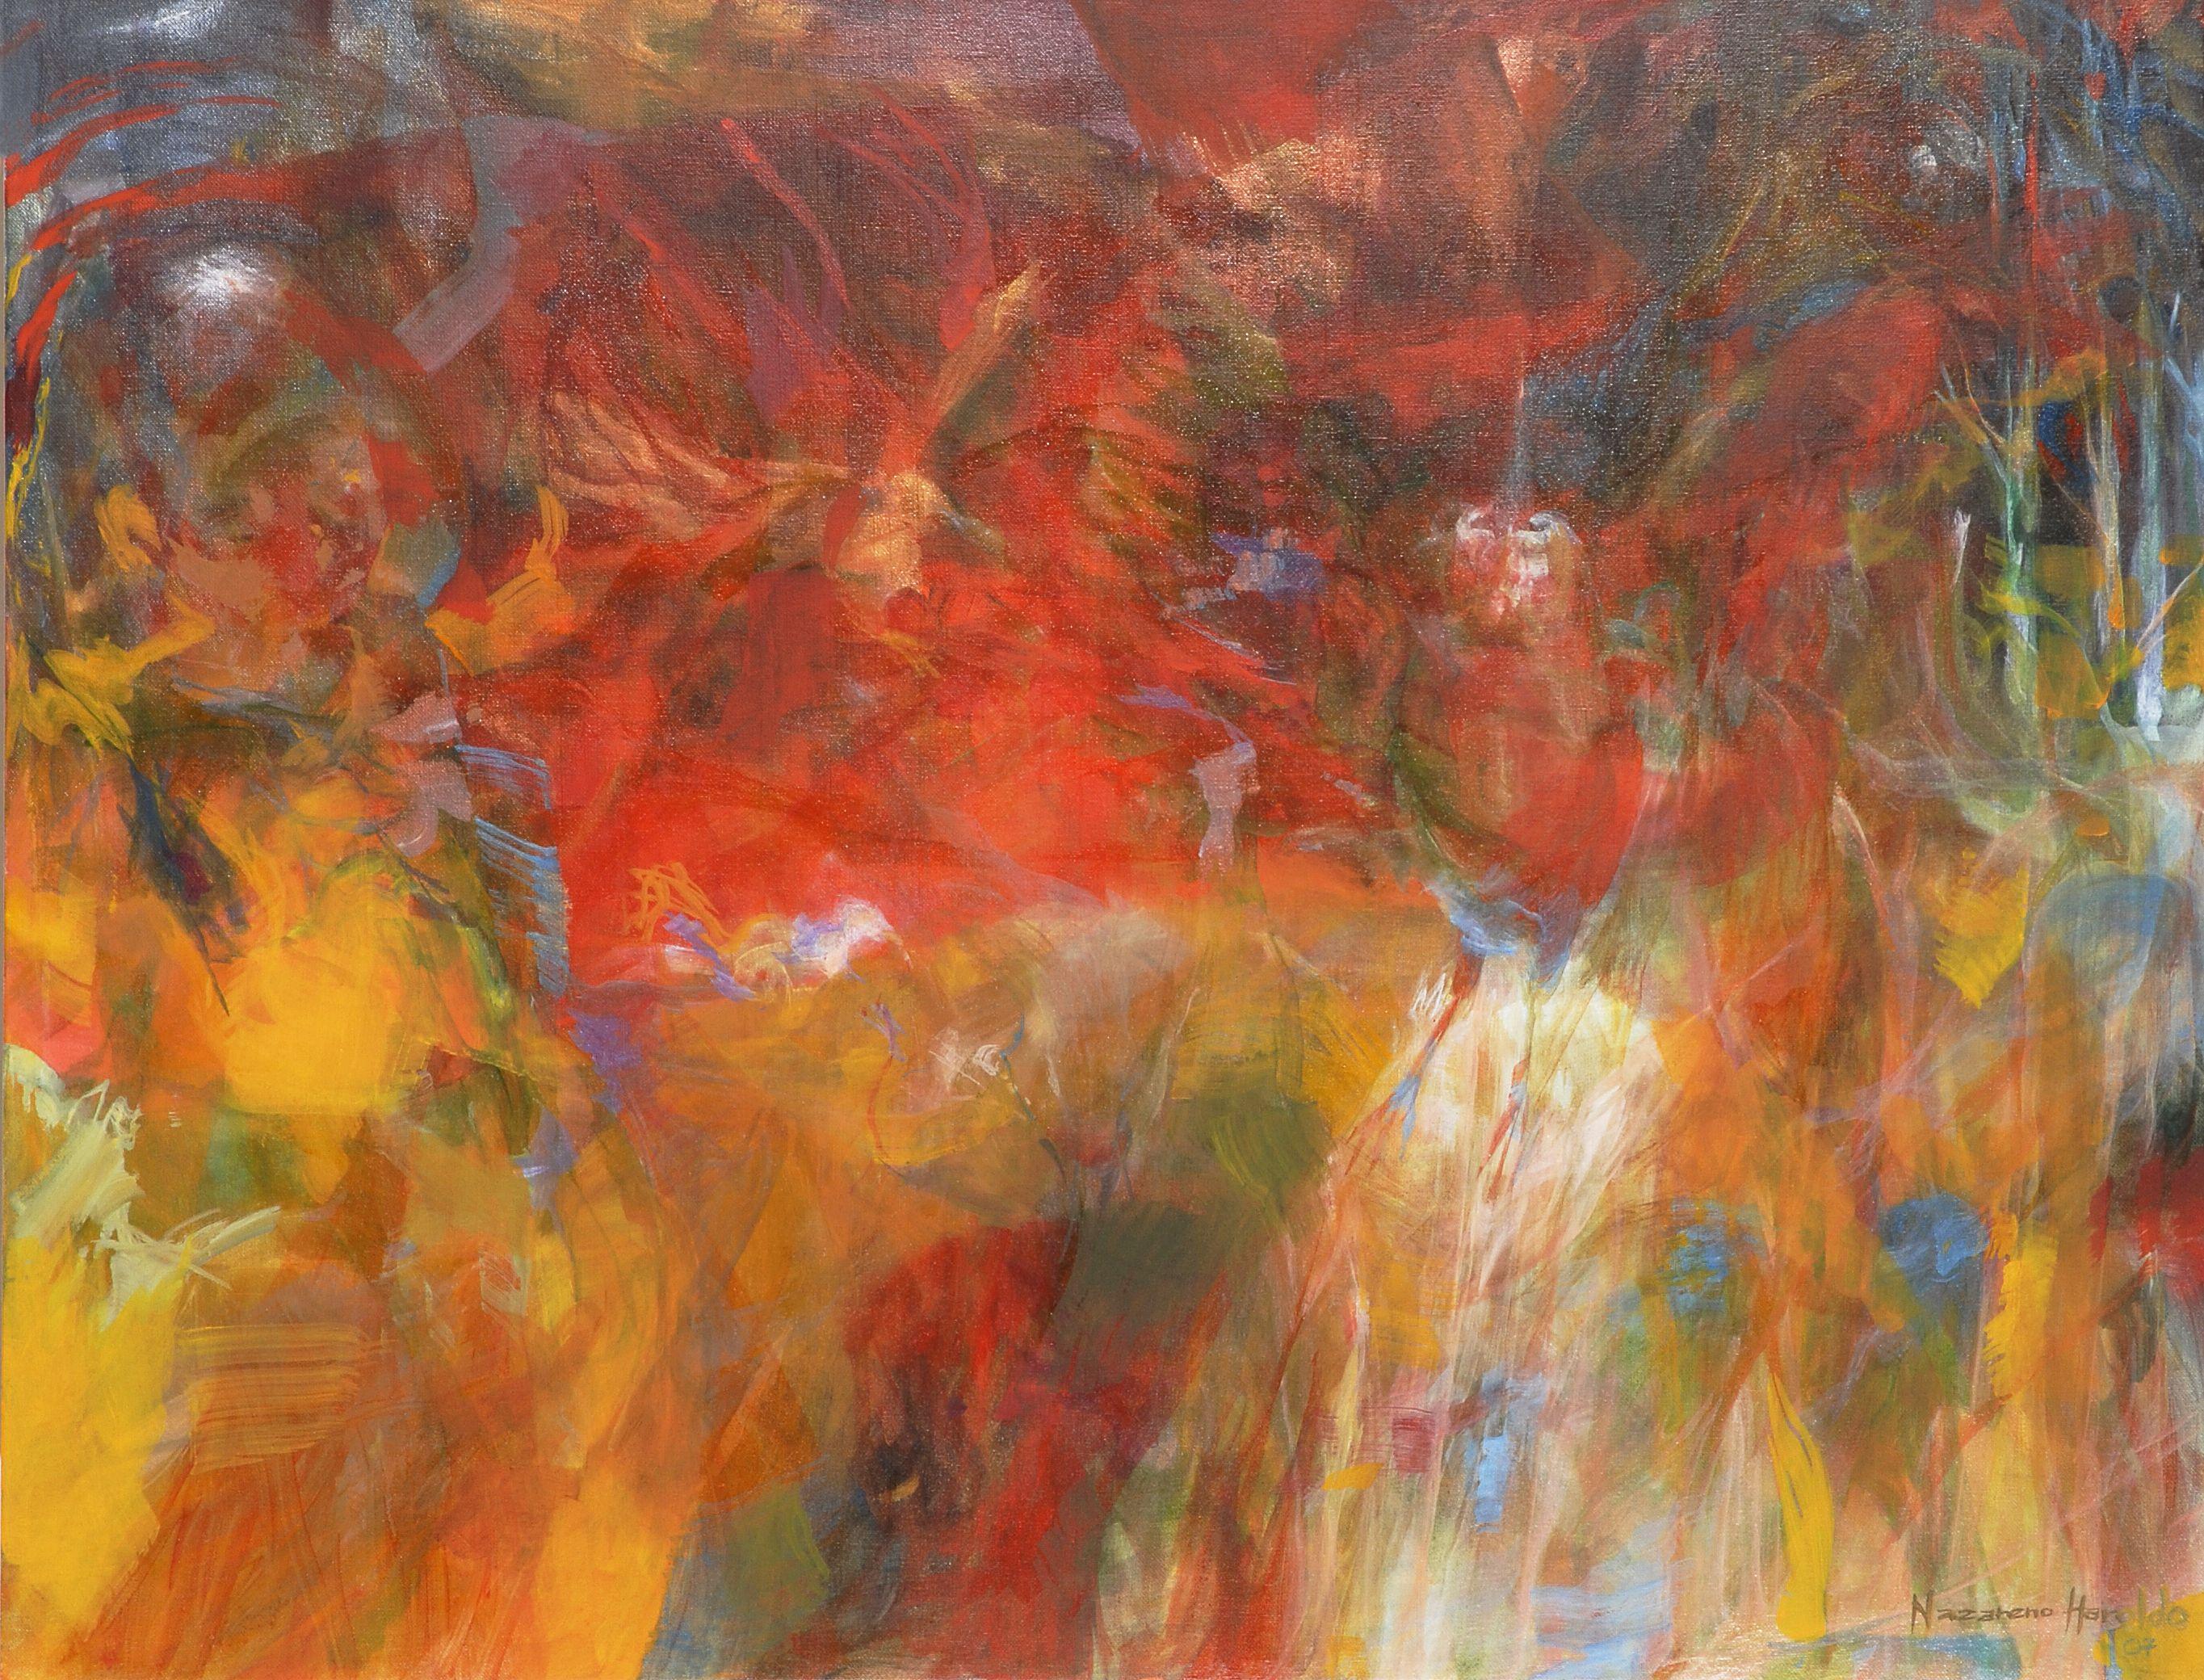 Oil on canvas 70 x 85 cm